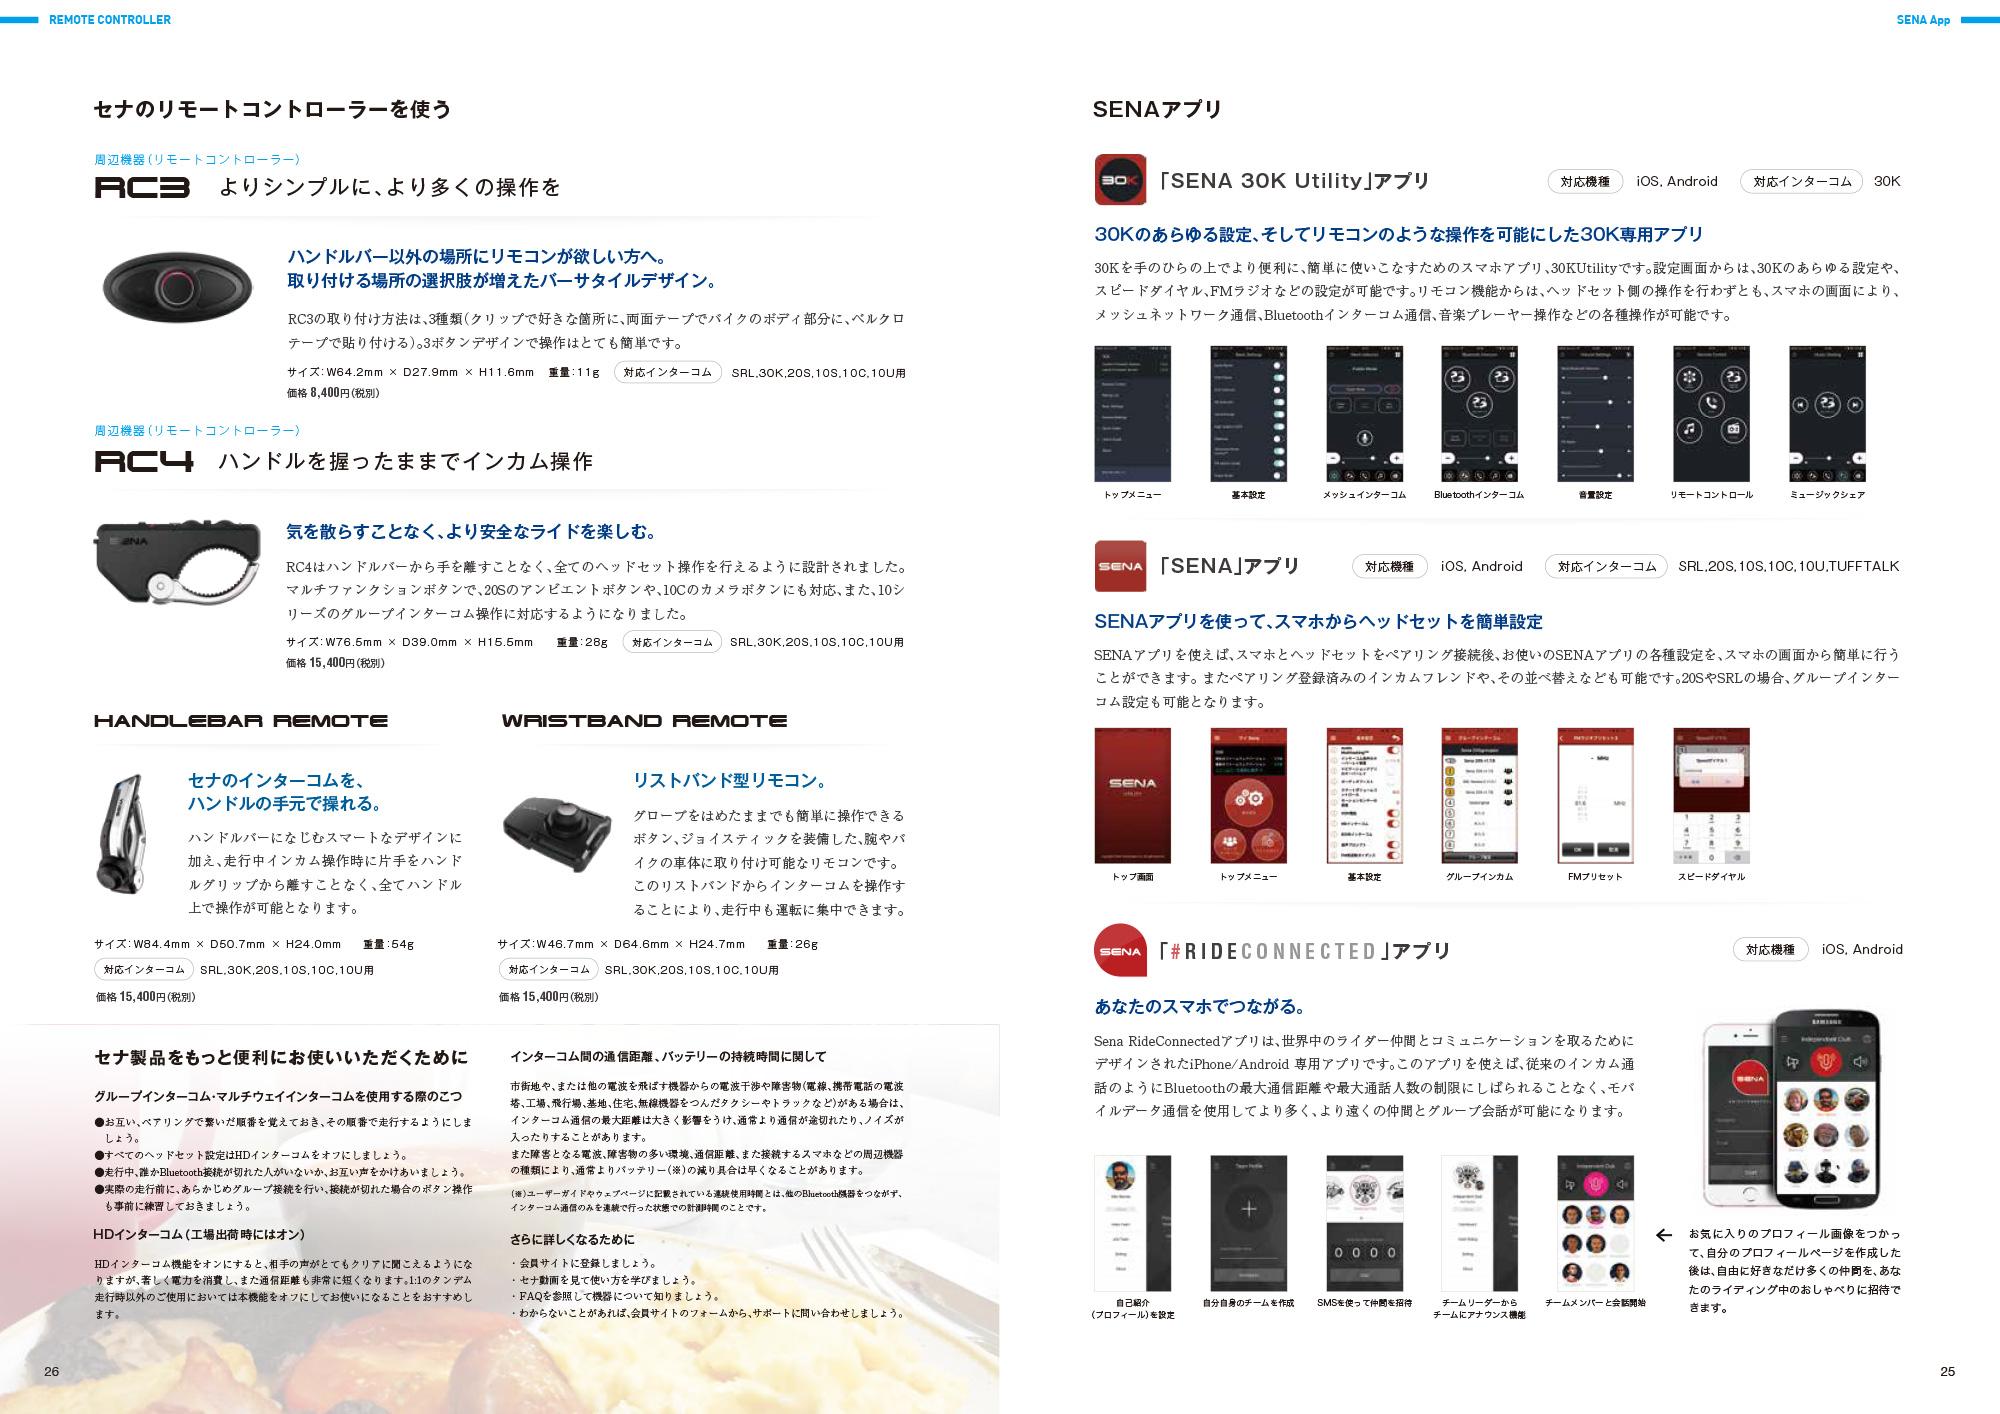 【14】SENAアプリ/セナのリモートコントローラーを使う